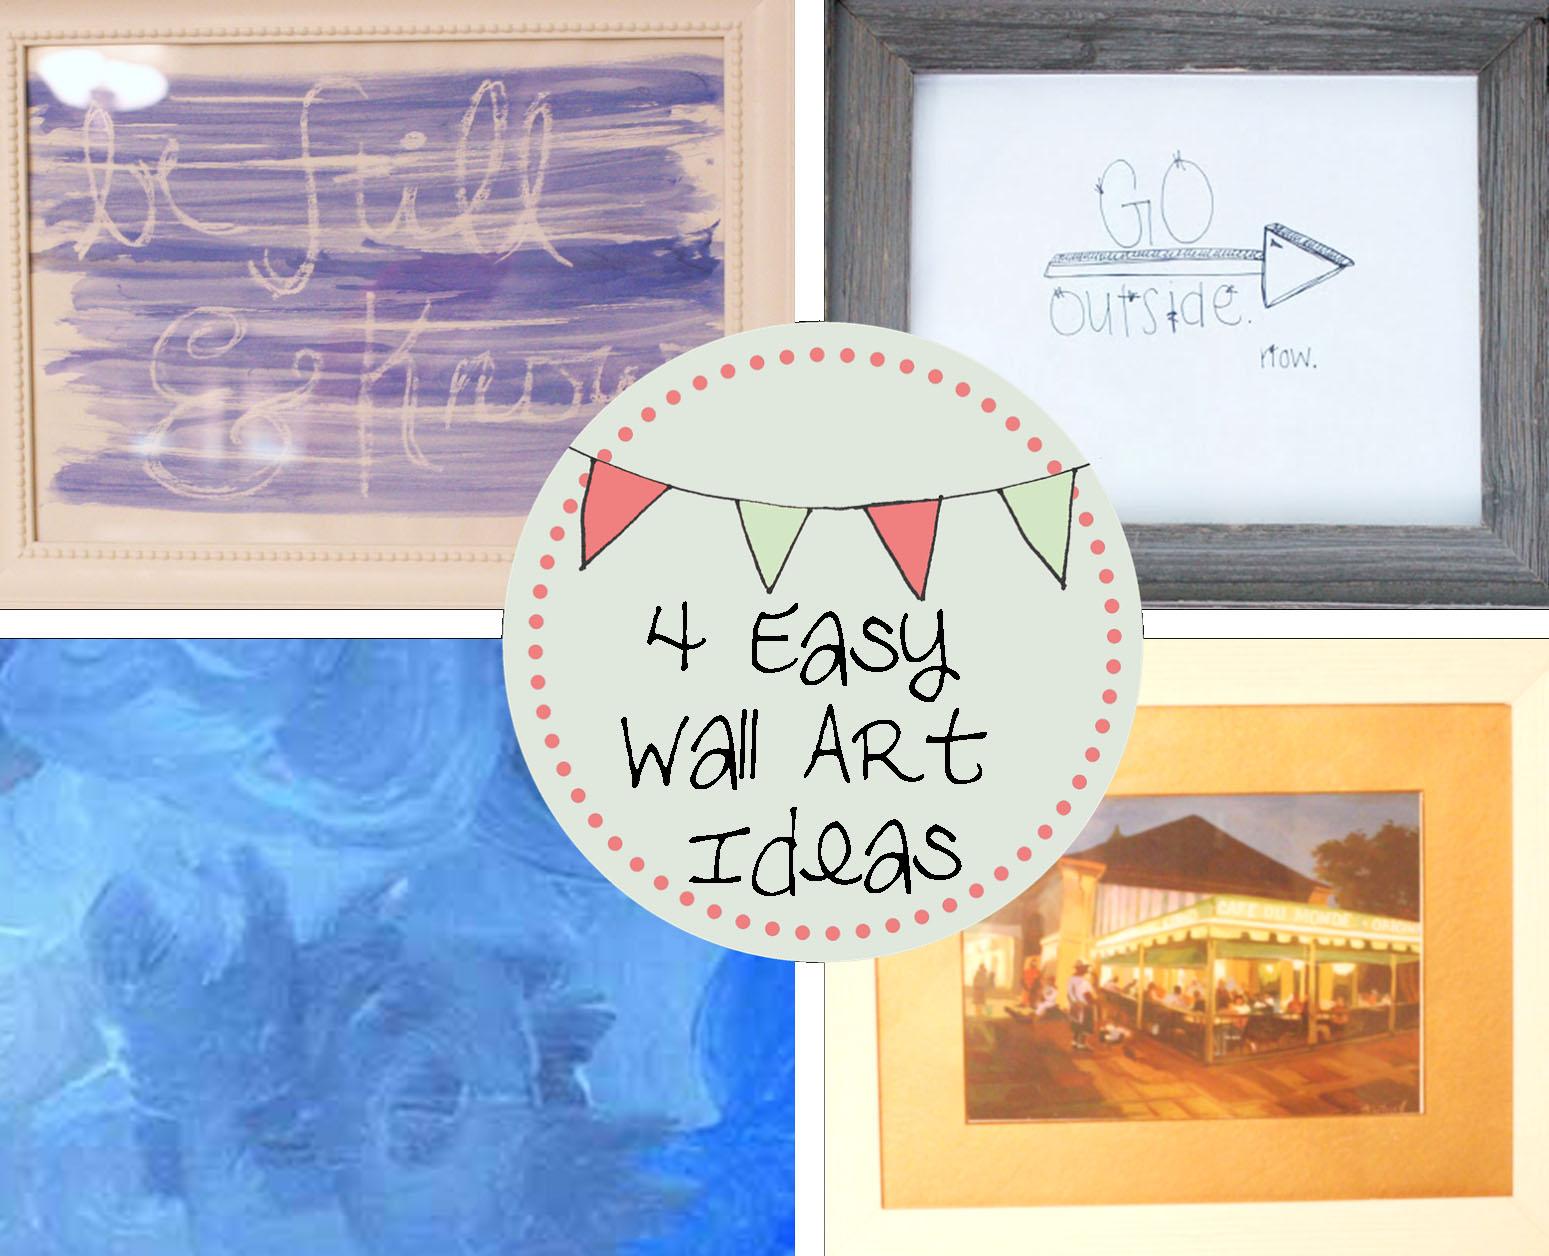 Craftivity Designs: Spring Spruce Up: 4 Easy Wall Art Ideas